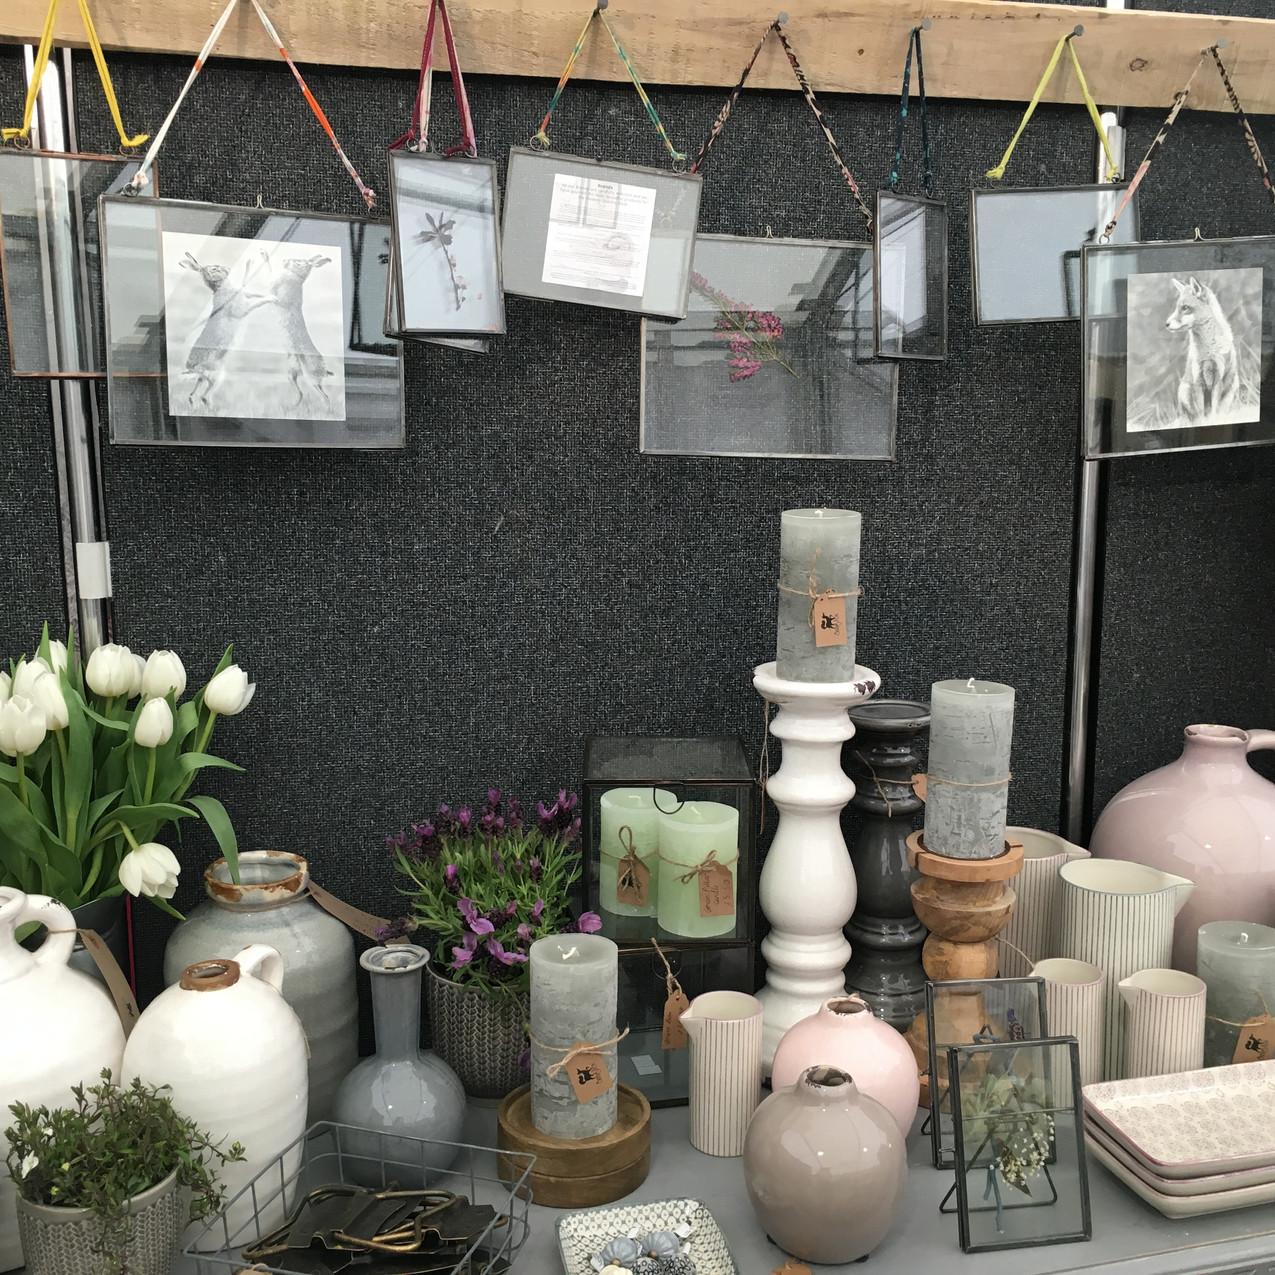 Ceramics and candle sticks